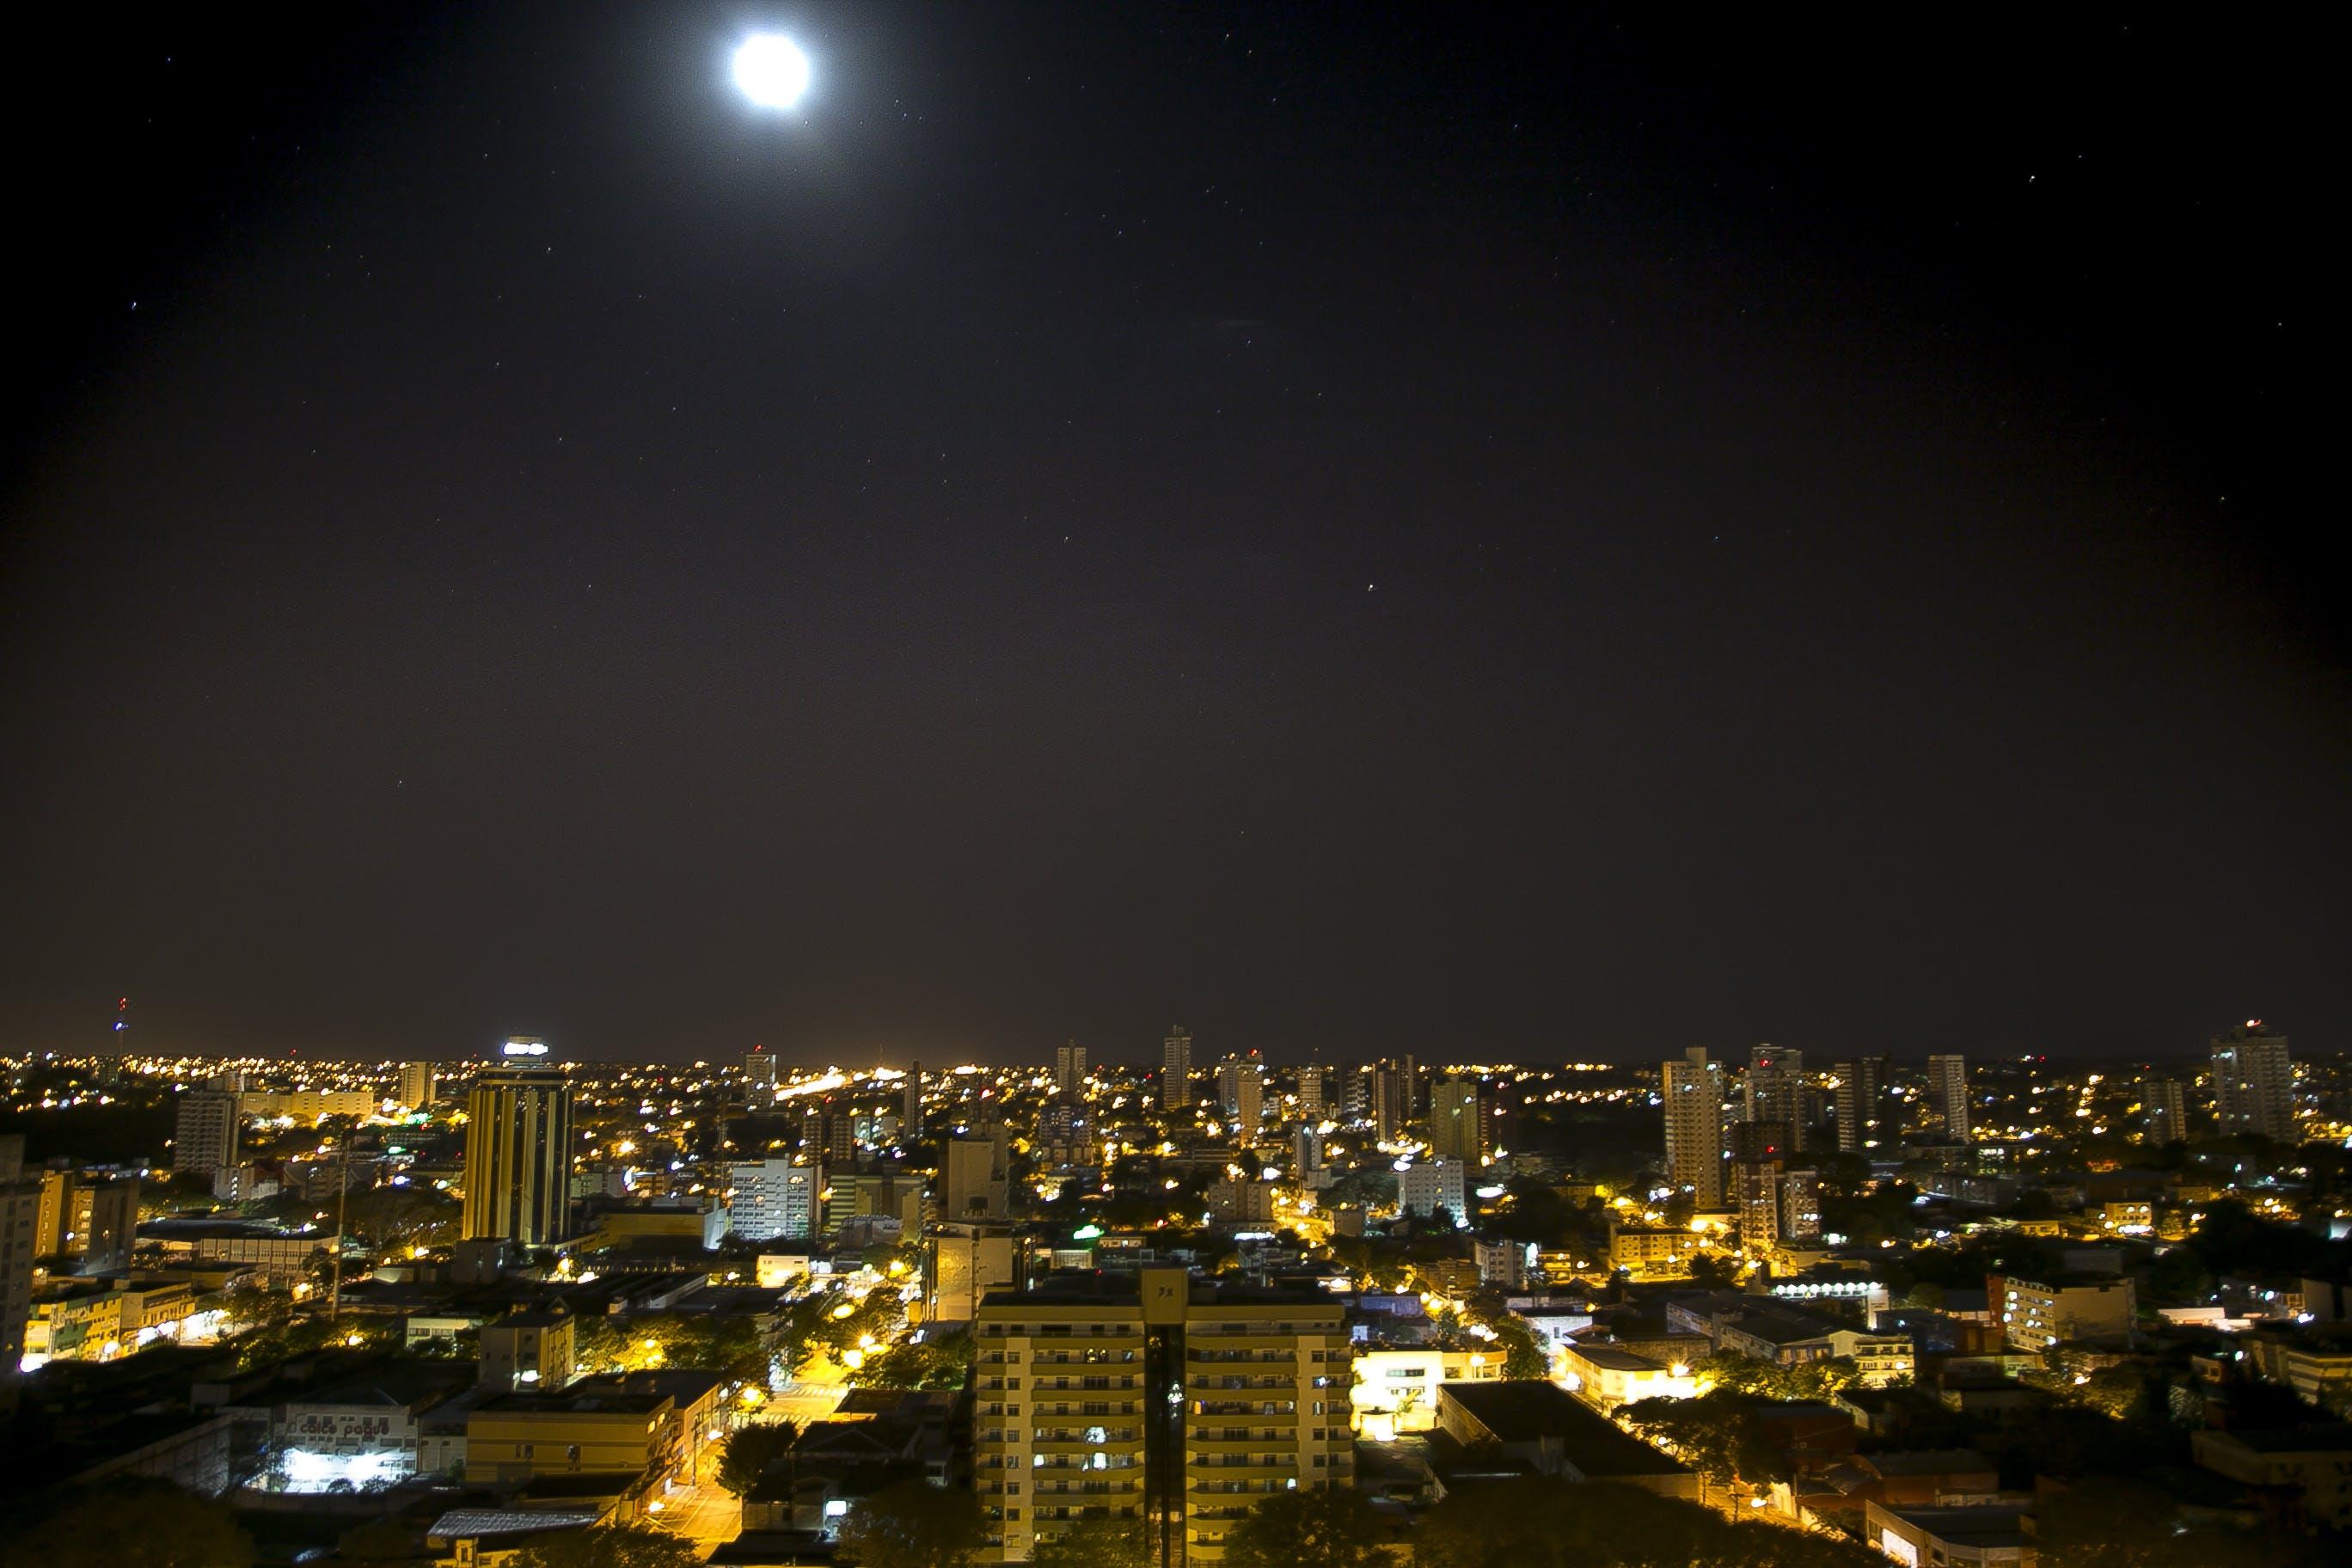 Free stock photo of city, night, skyline, foz do iguaçu